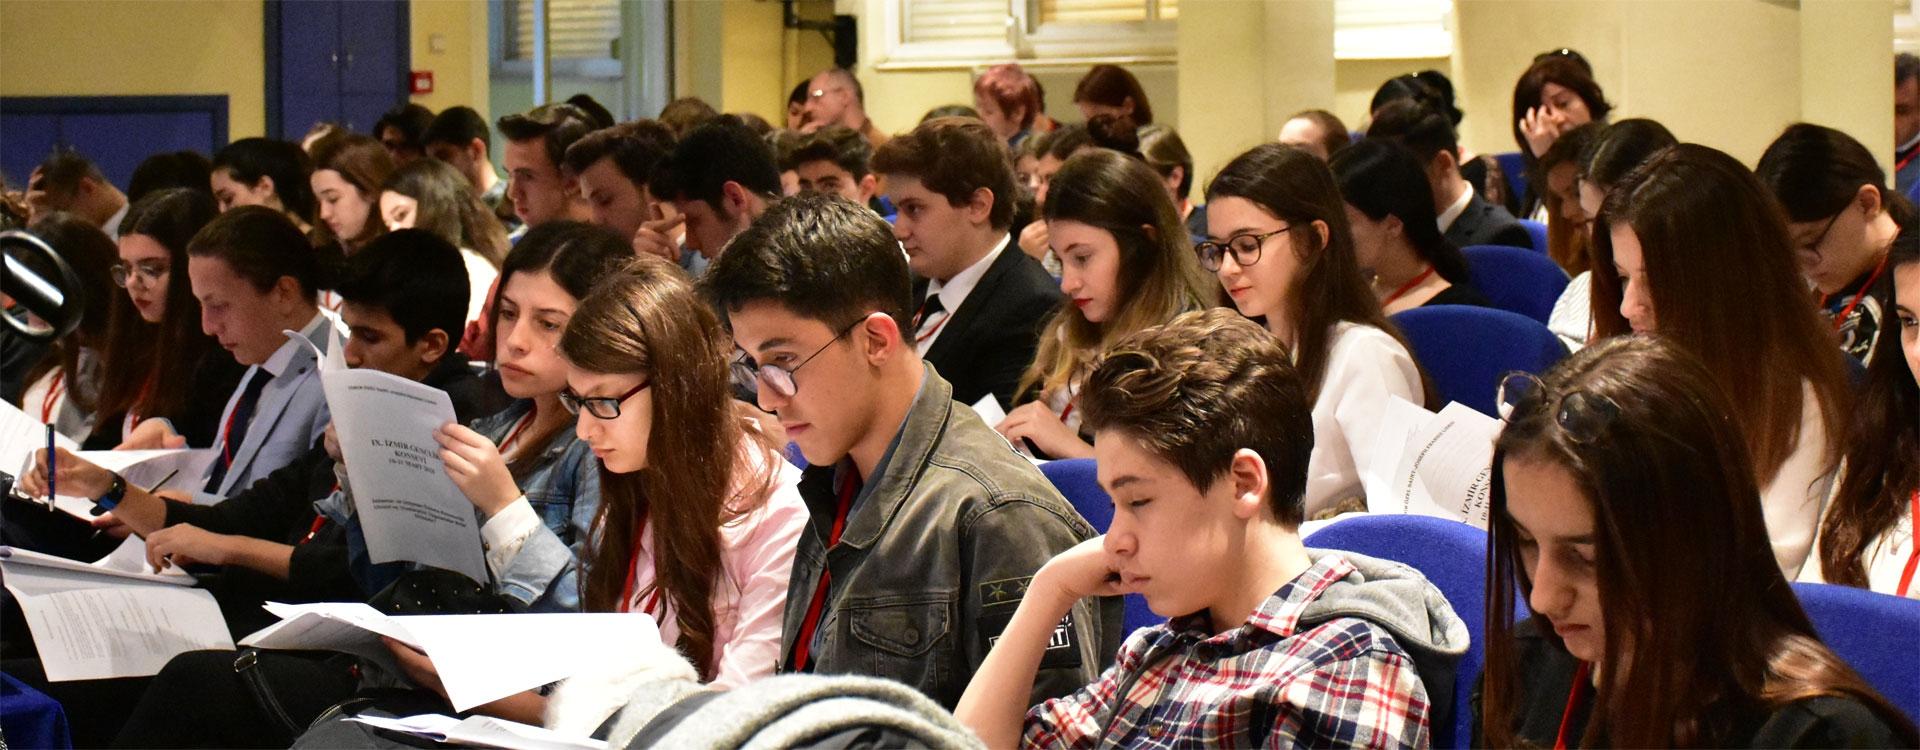 IX. Gençlik Konseyi